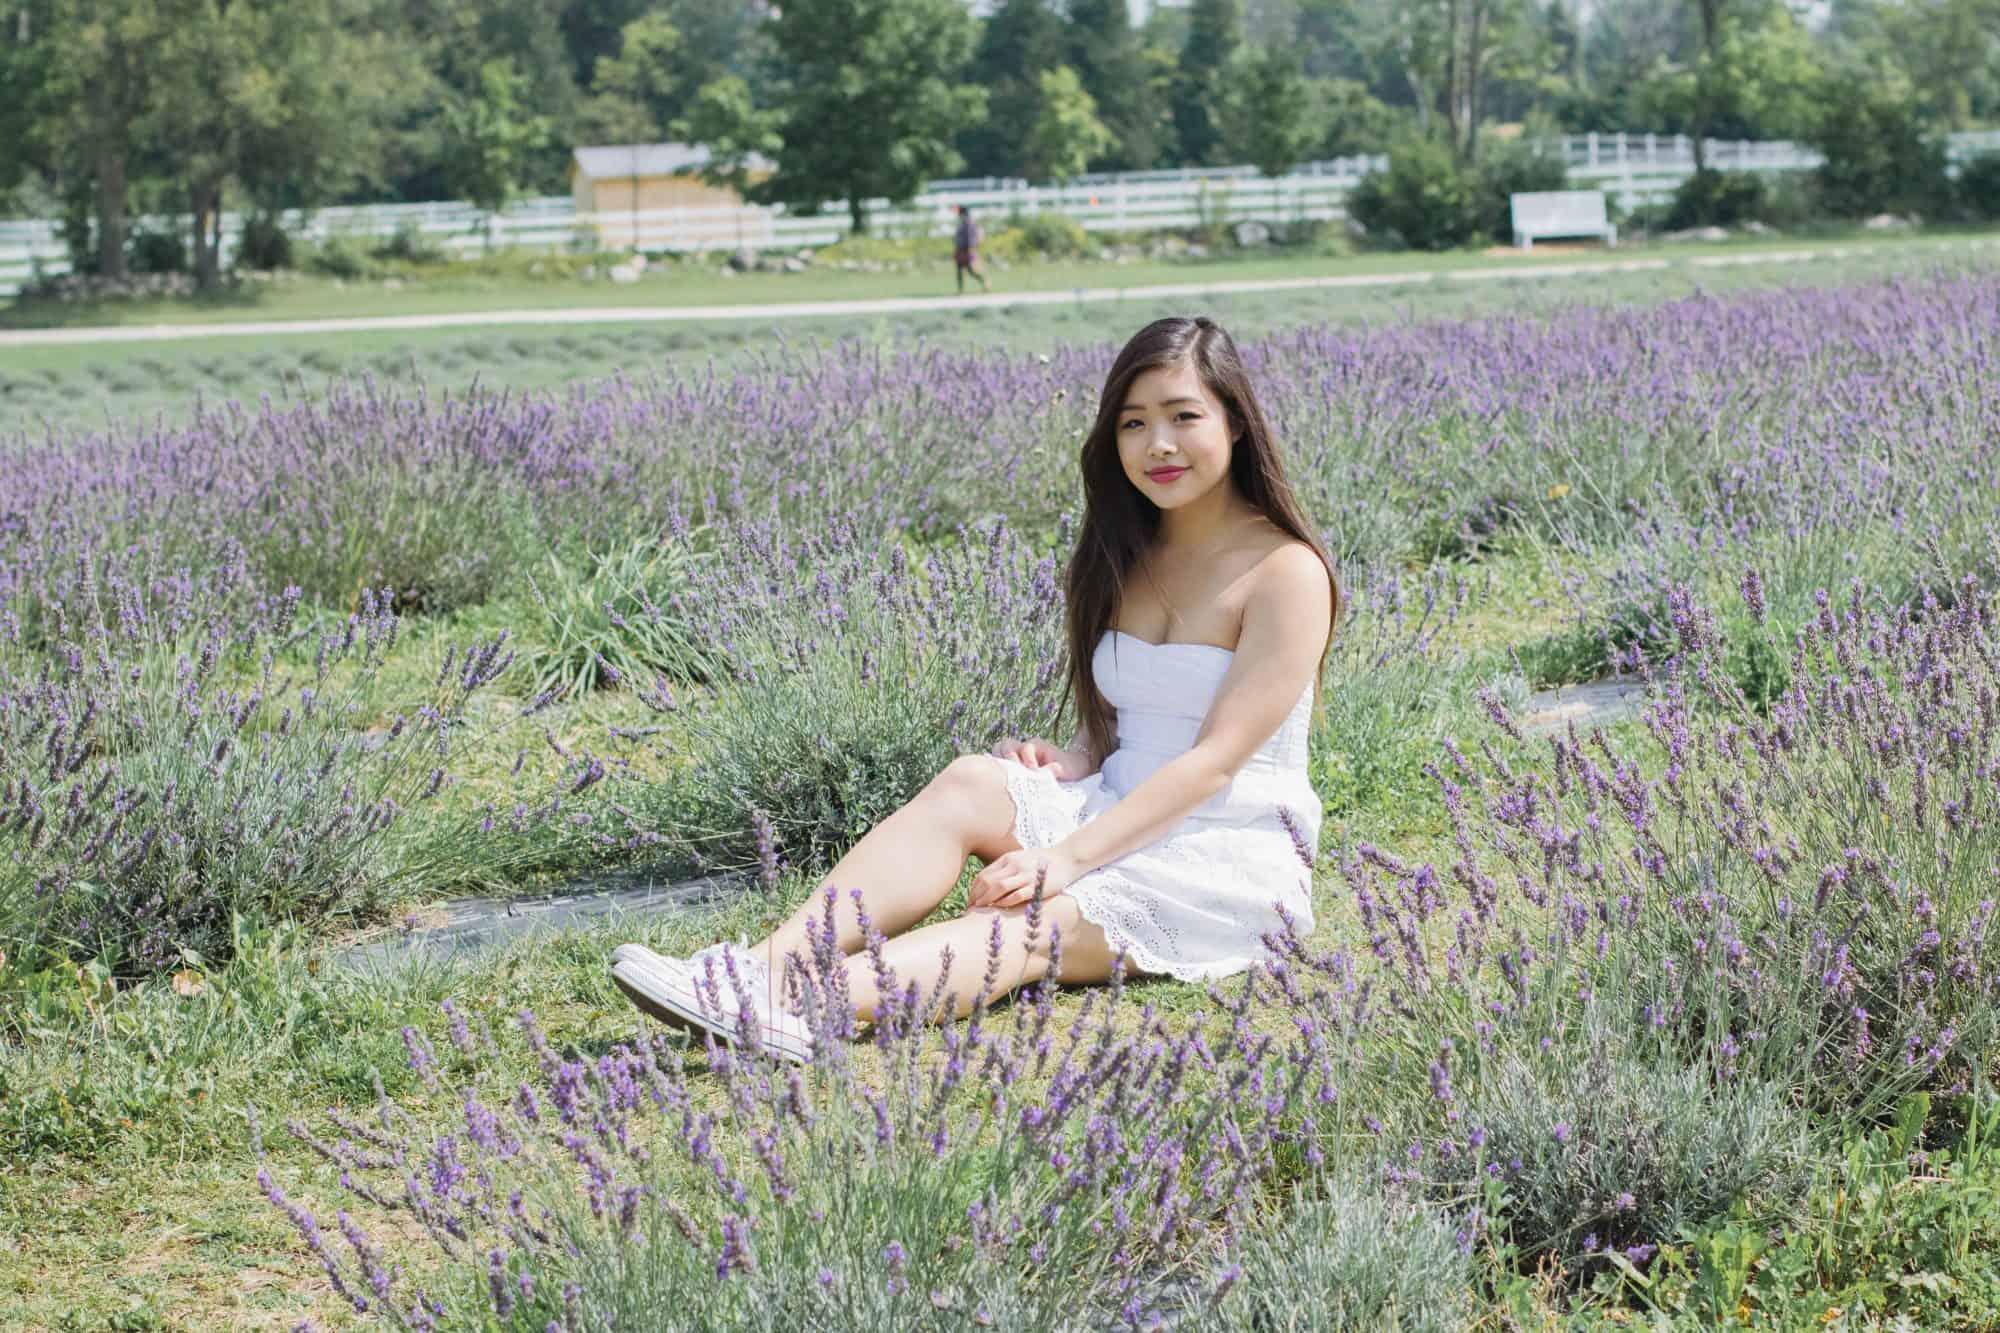 Milton, Ontario   summer road trip ideas near Toronto   Diary of a Toronto Girl, a Canadian lifestyle blog